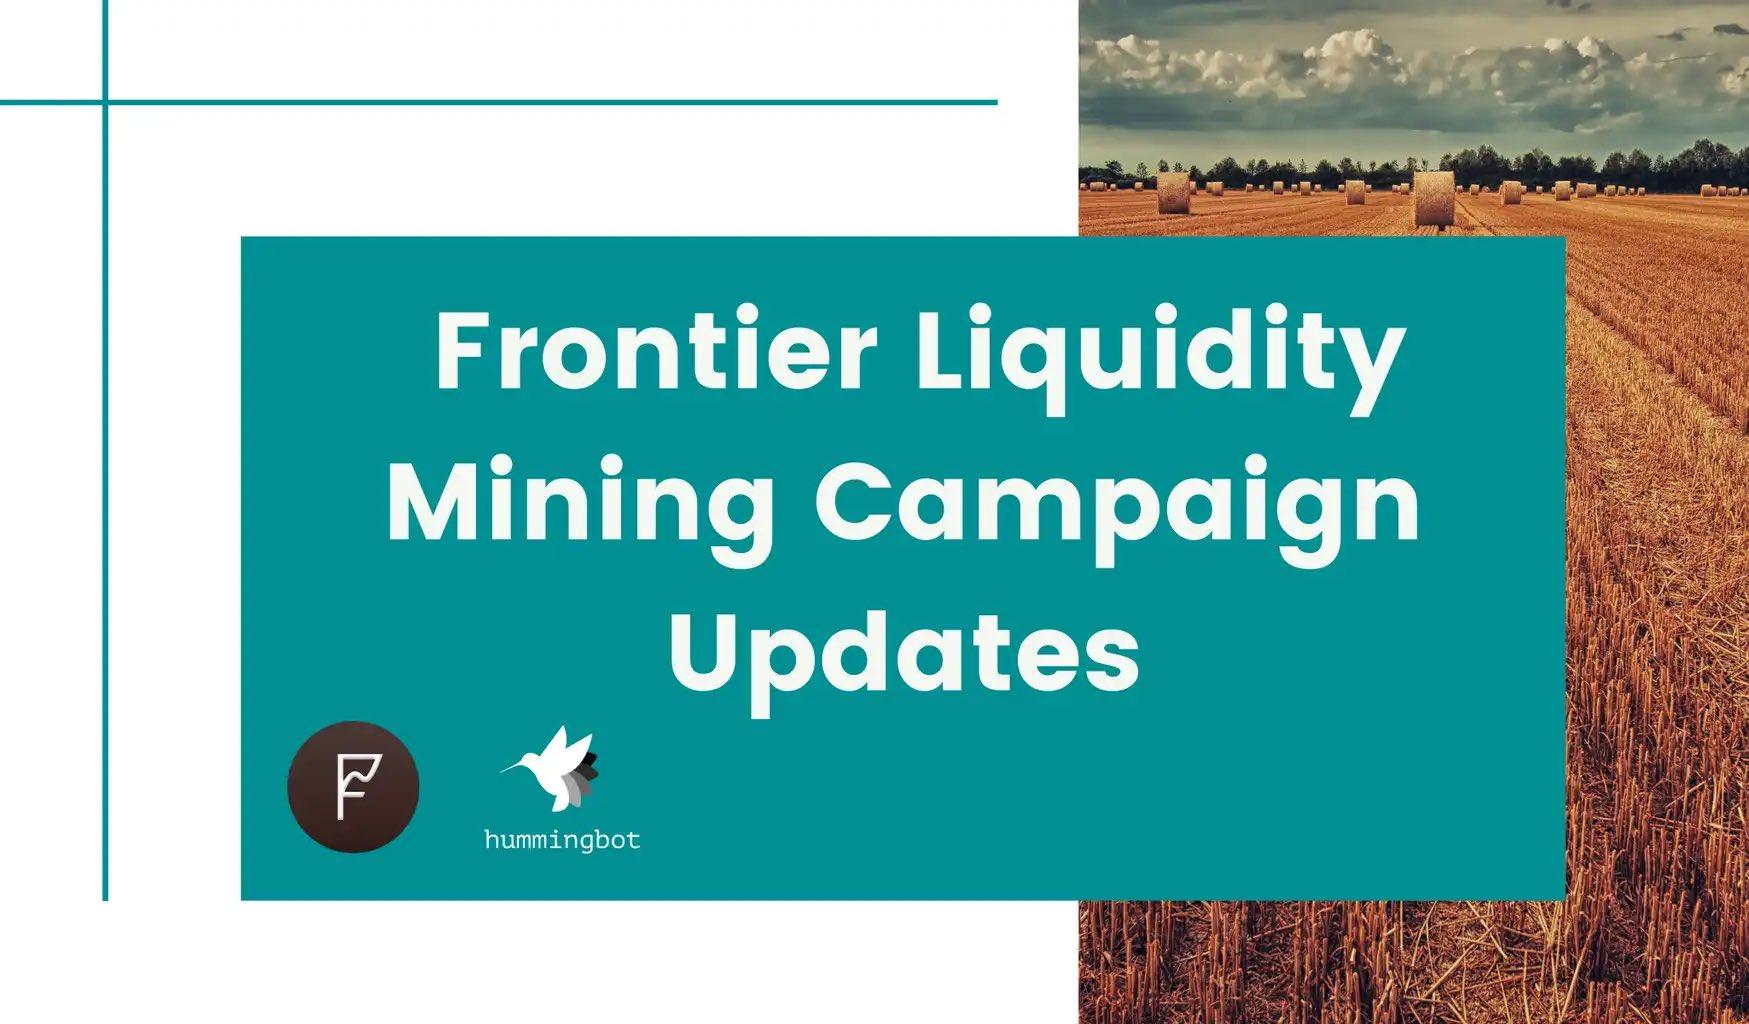 Frontier Liquidity Mining Campaign Updates